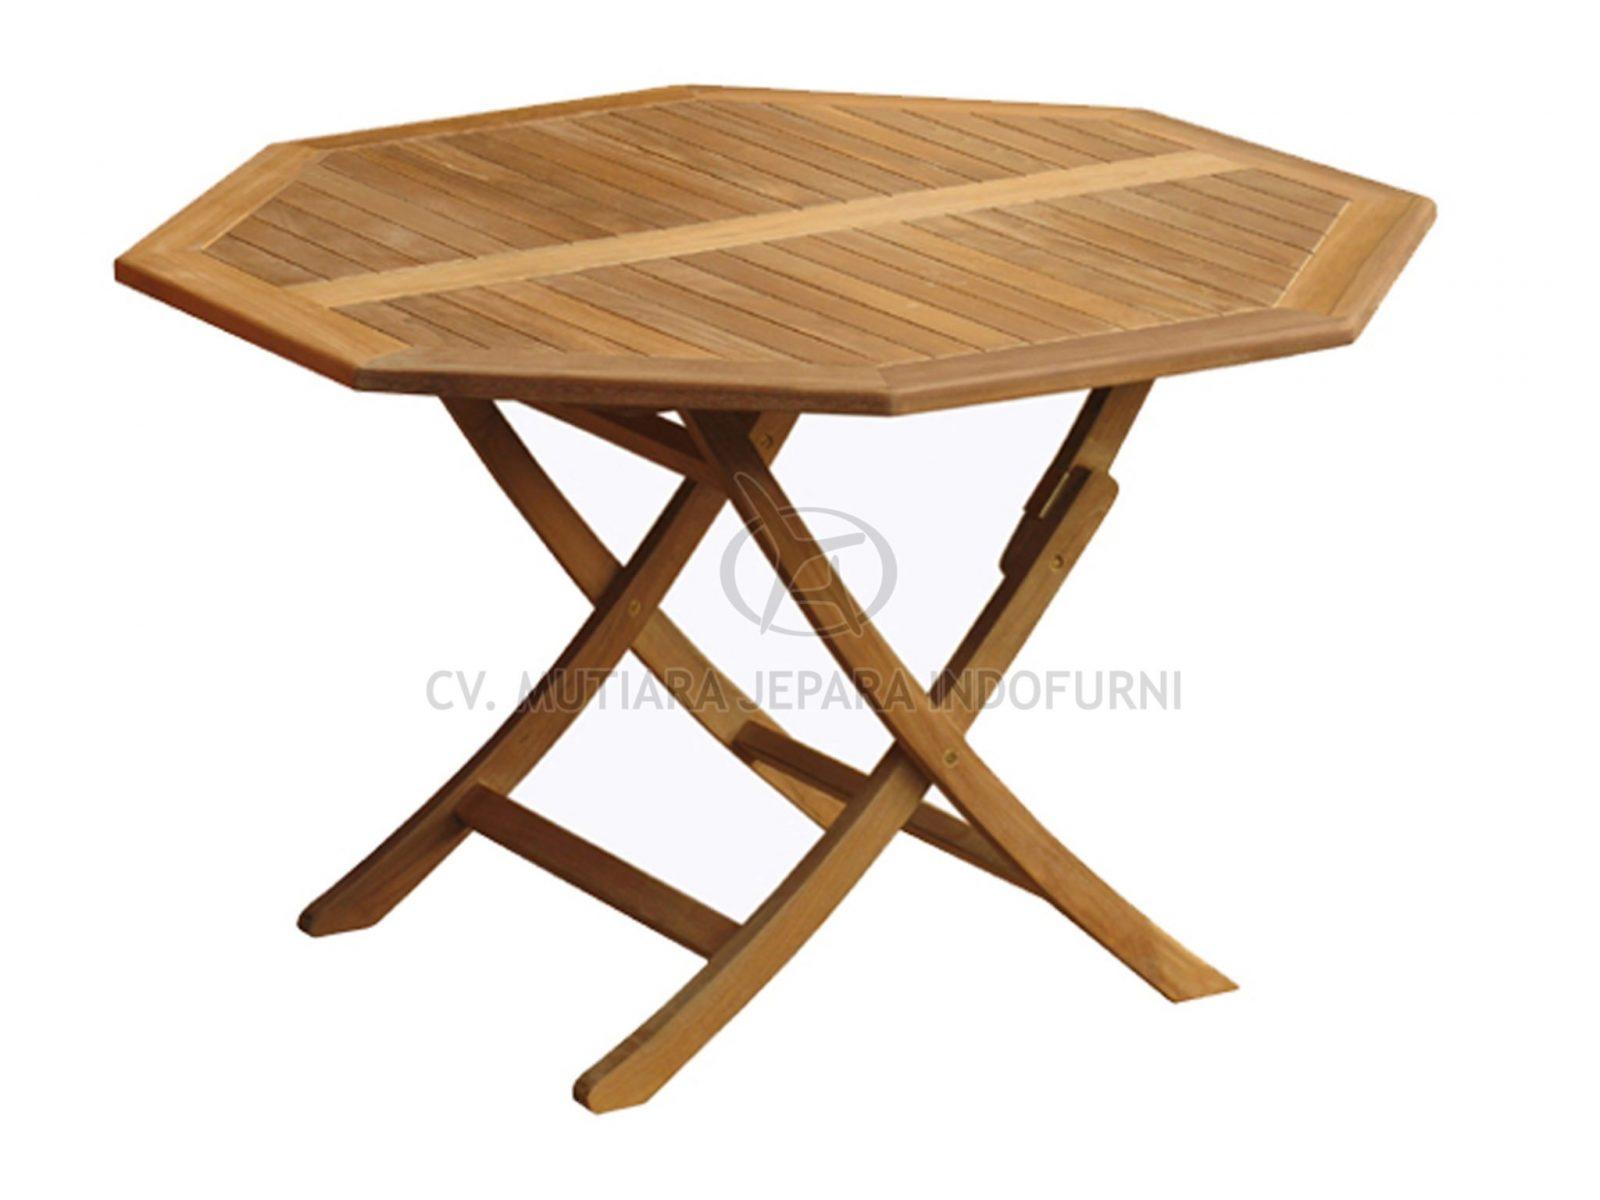 Octagonal Easy Fold Table 120cm Indonesia Furniture Manufacturer